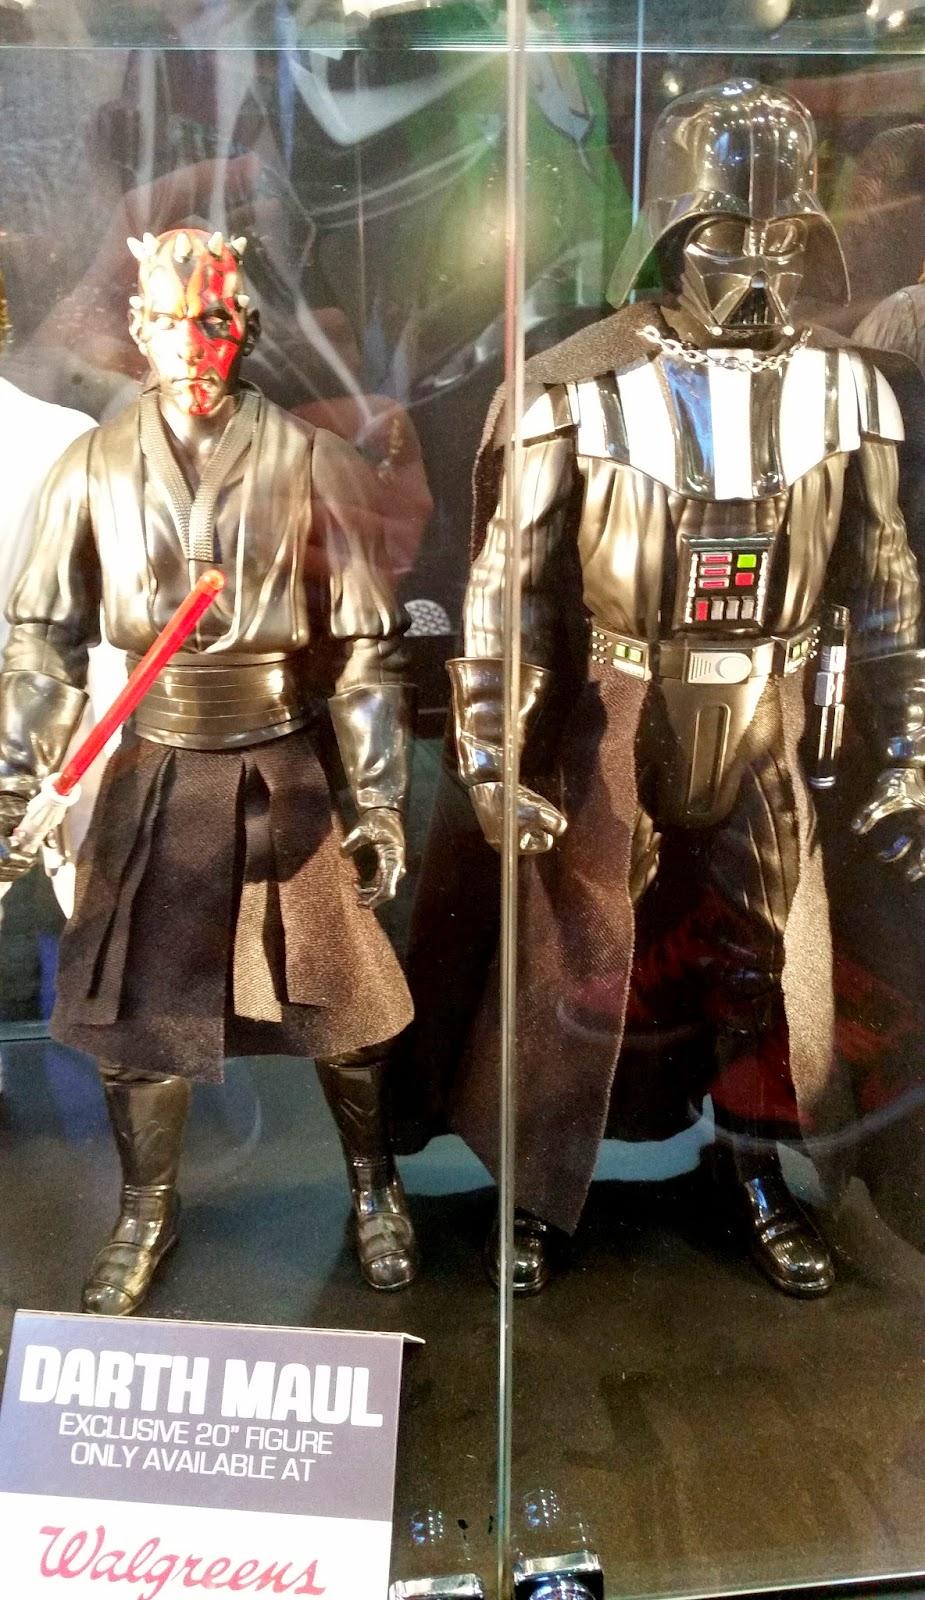 NEW FIGURES Star Wars Black Series 3.75 Figures  U CHOOSE Walmart Exclusives!